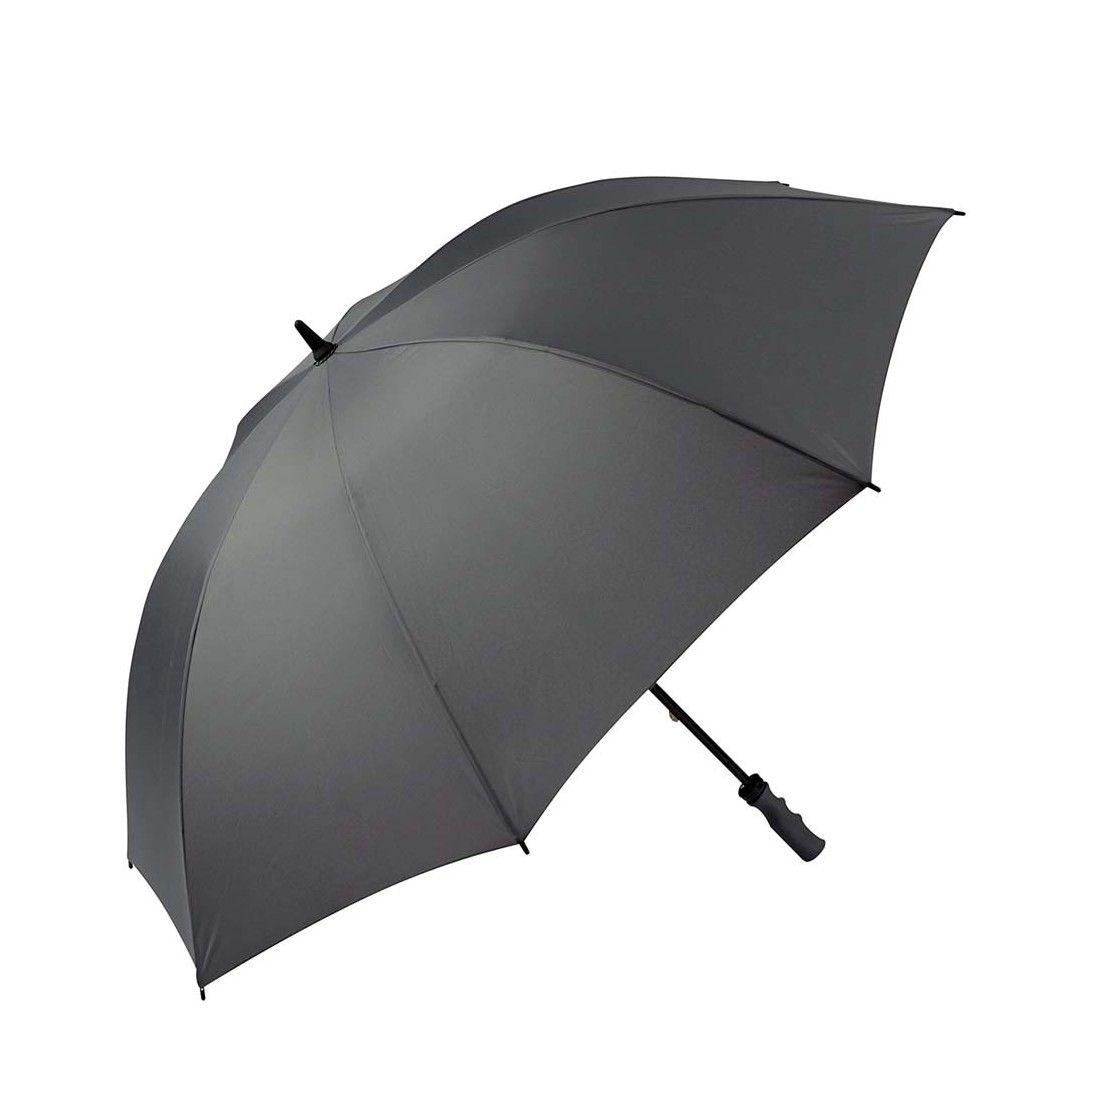 Paraguas 11905 Ezpeleta